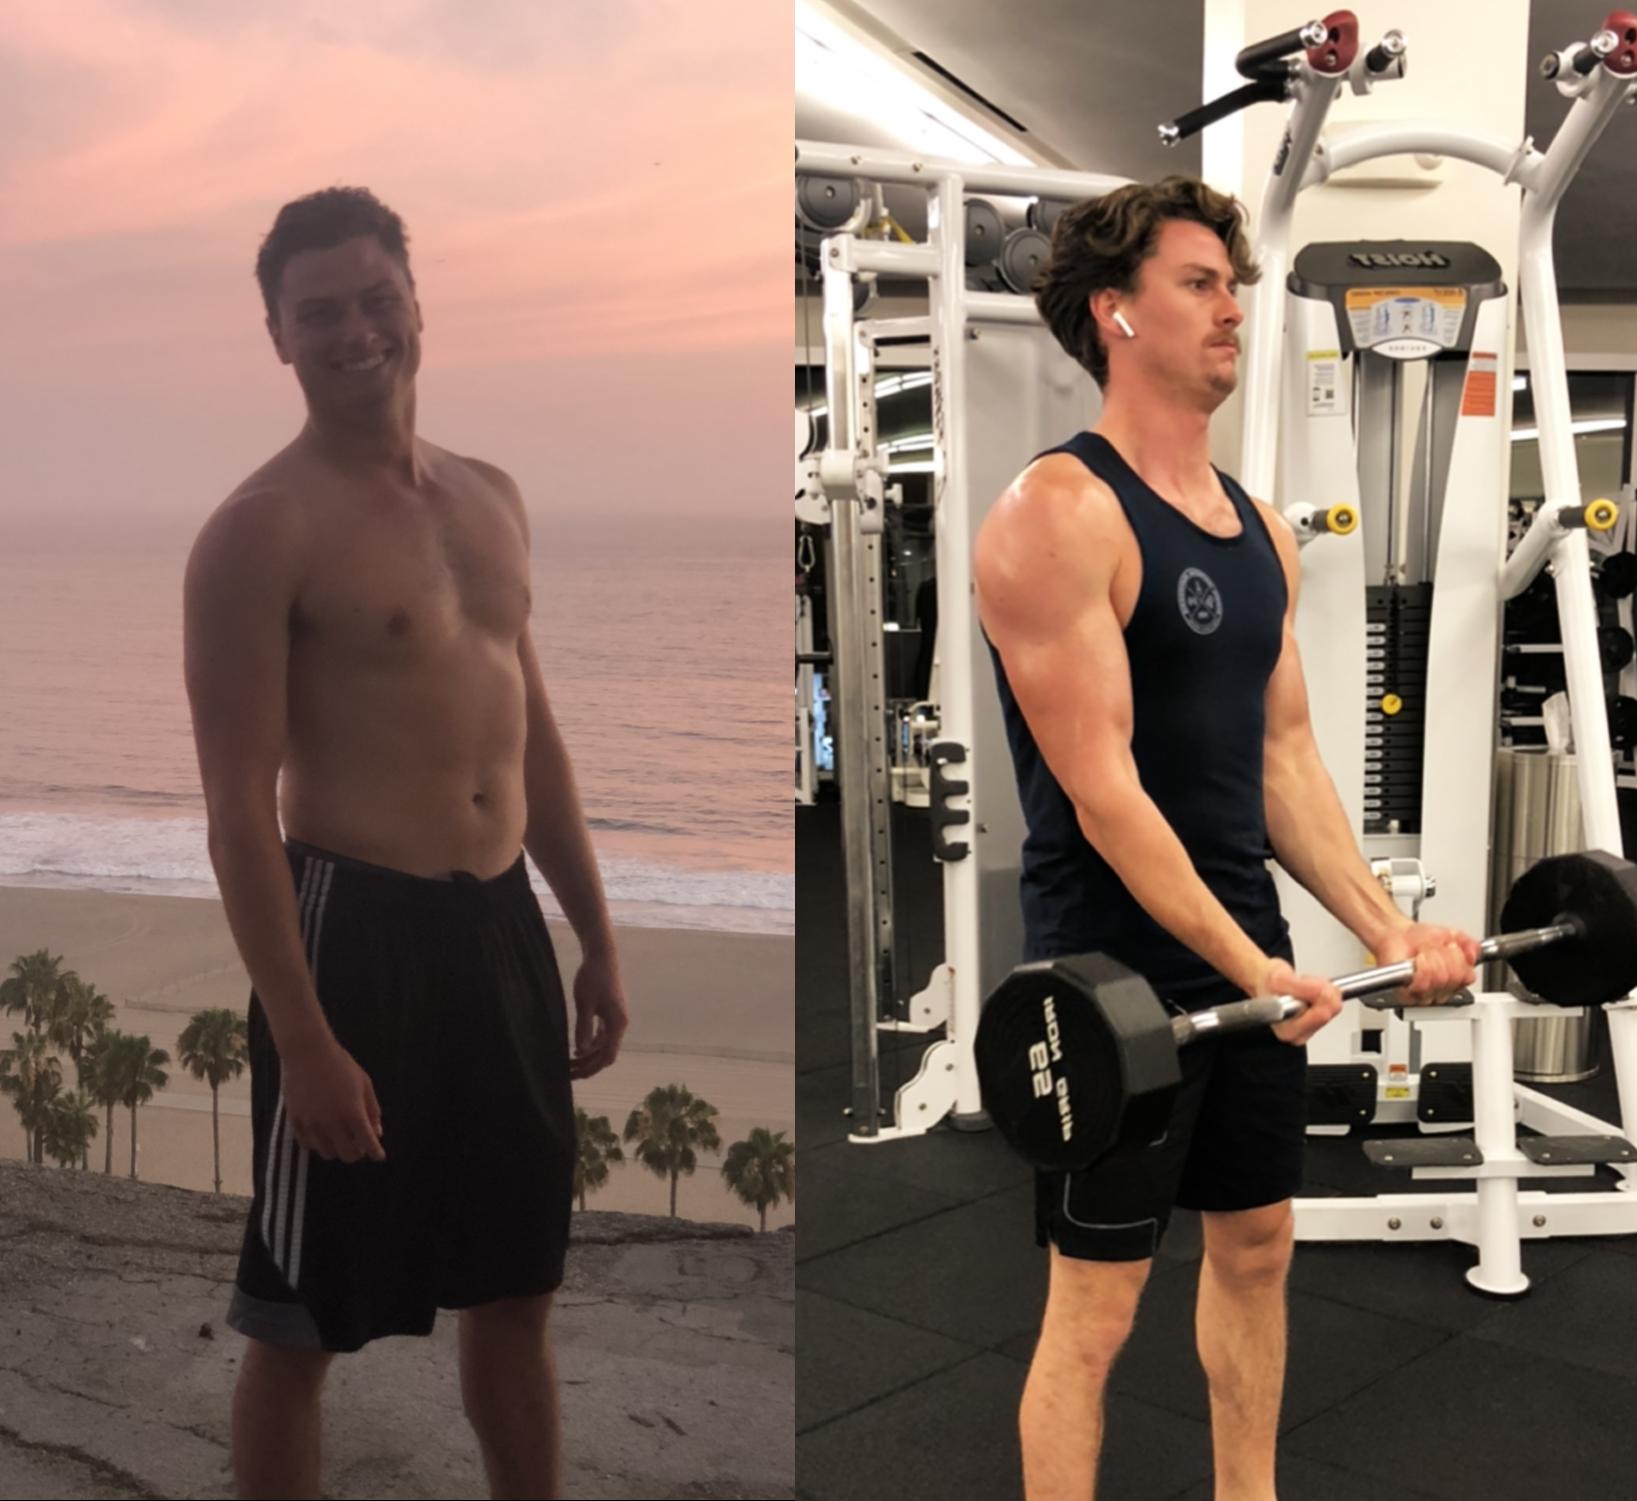 Meet Adam, 21 Years